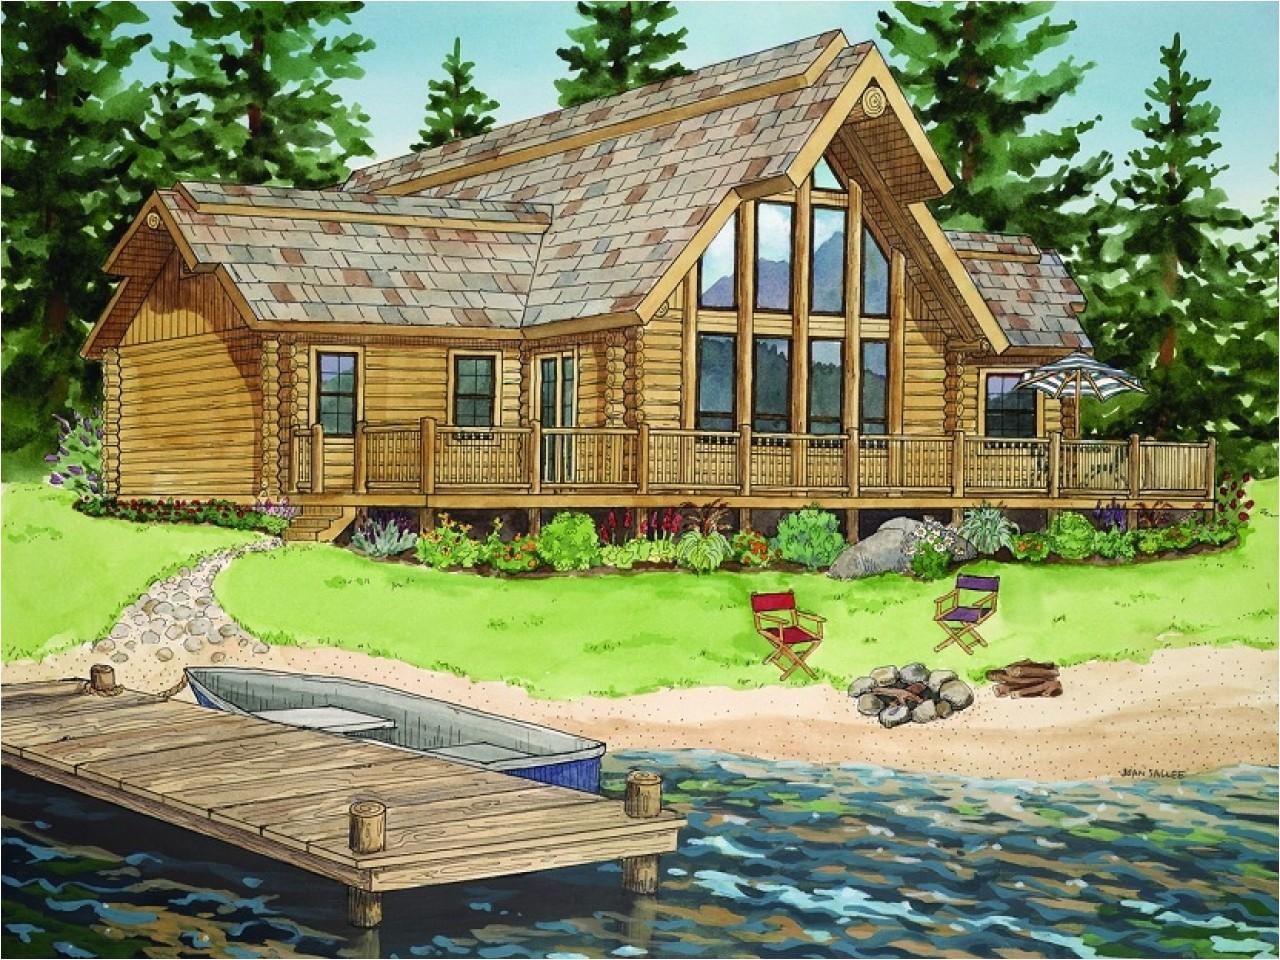 a7468b8317fbcba8 ranch log cabin homes ranch style log home plans